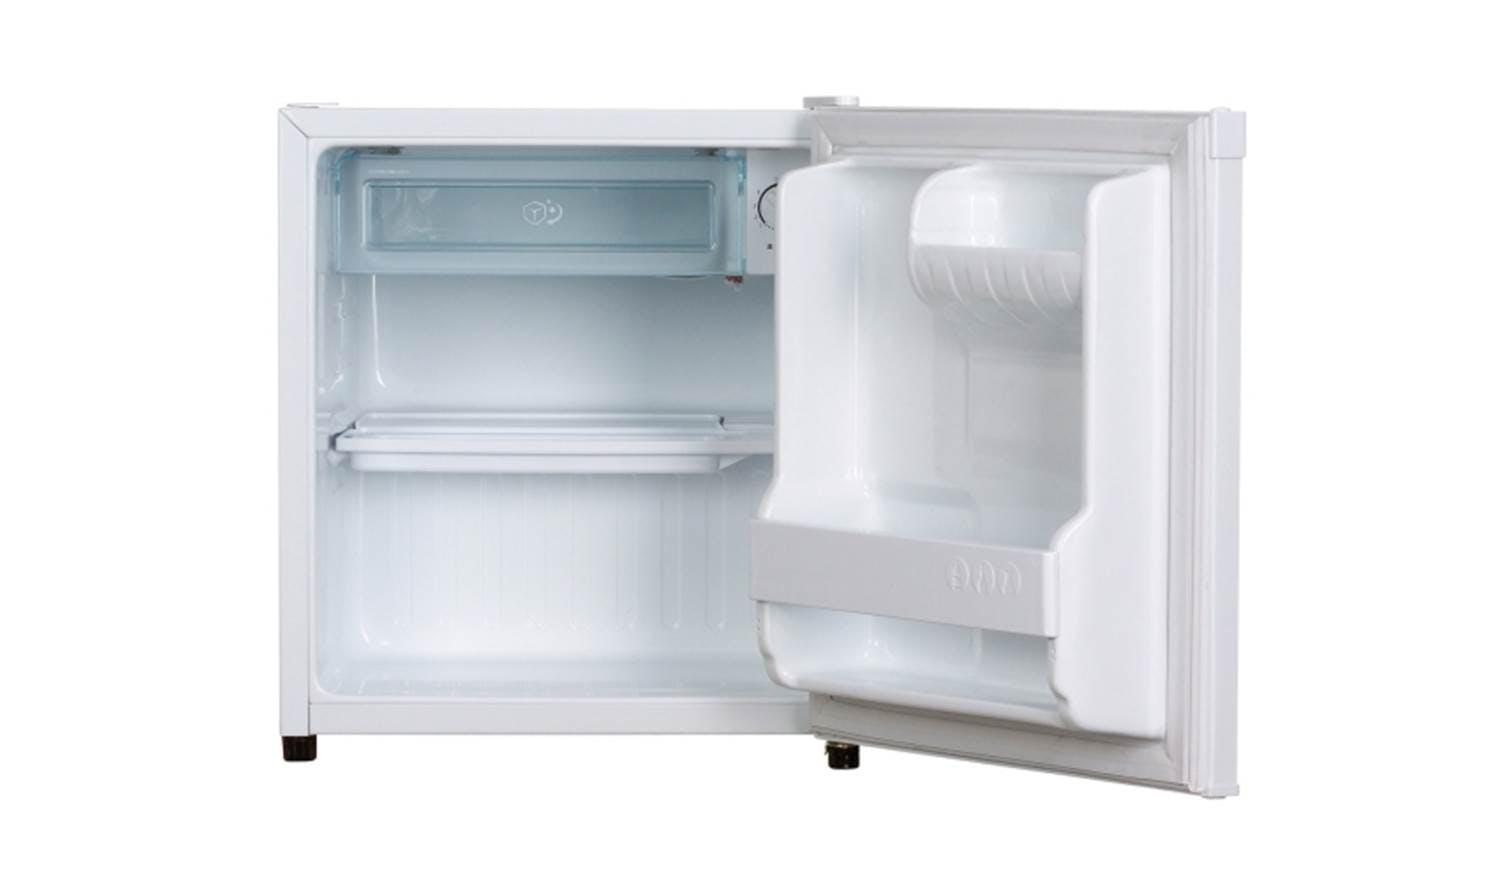 Lg Gl 051sq 43l Bar Fridge Harvey Norman Singapore Refrigerator Electrical Wiring Diagram Pdf Wishlist Compare